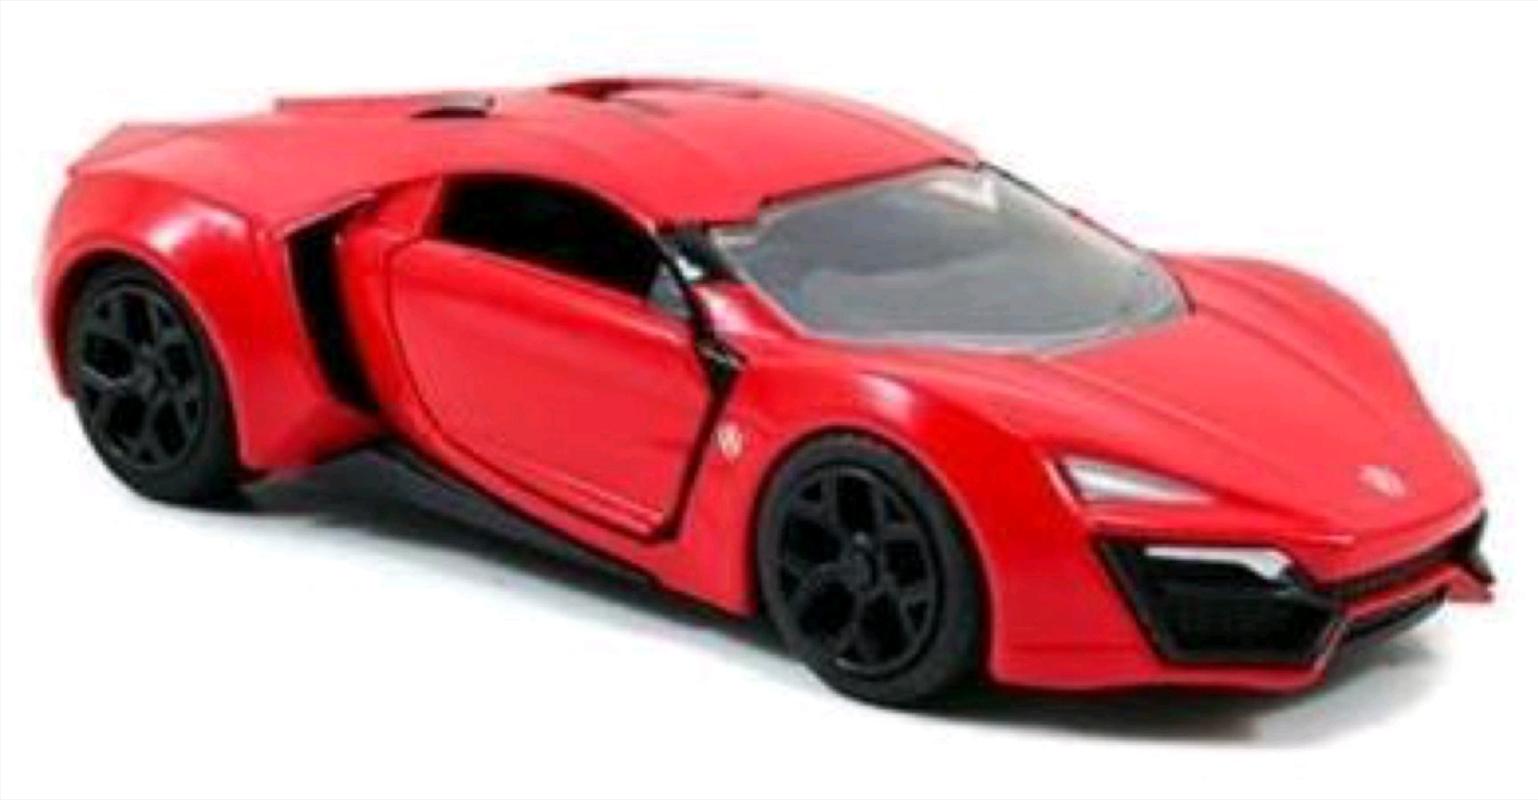 Fast & Furious - Lykan Hypersport 1:32 Hollywood Ride | Merchandise